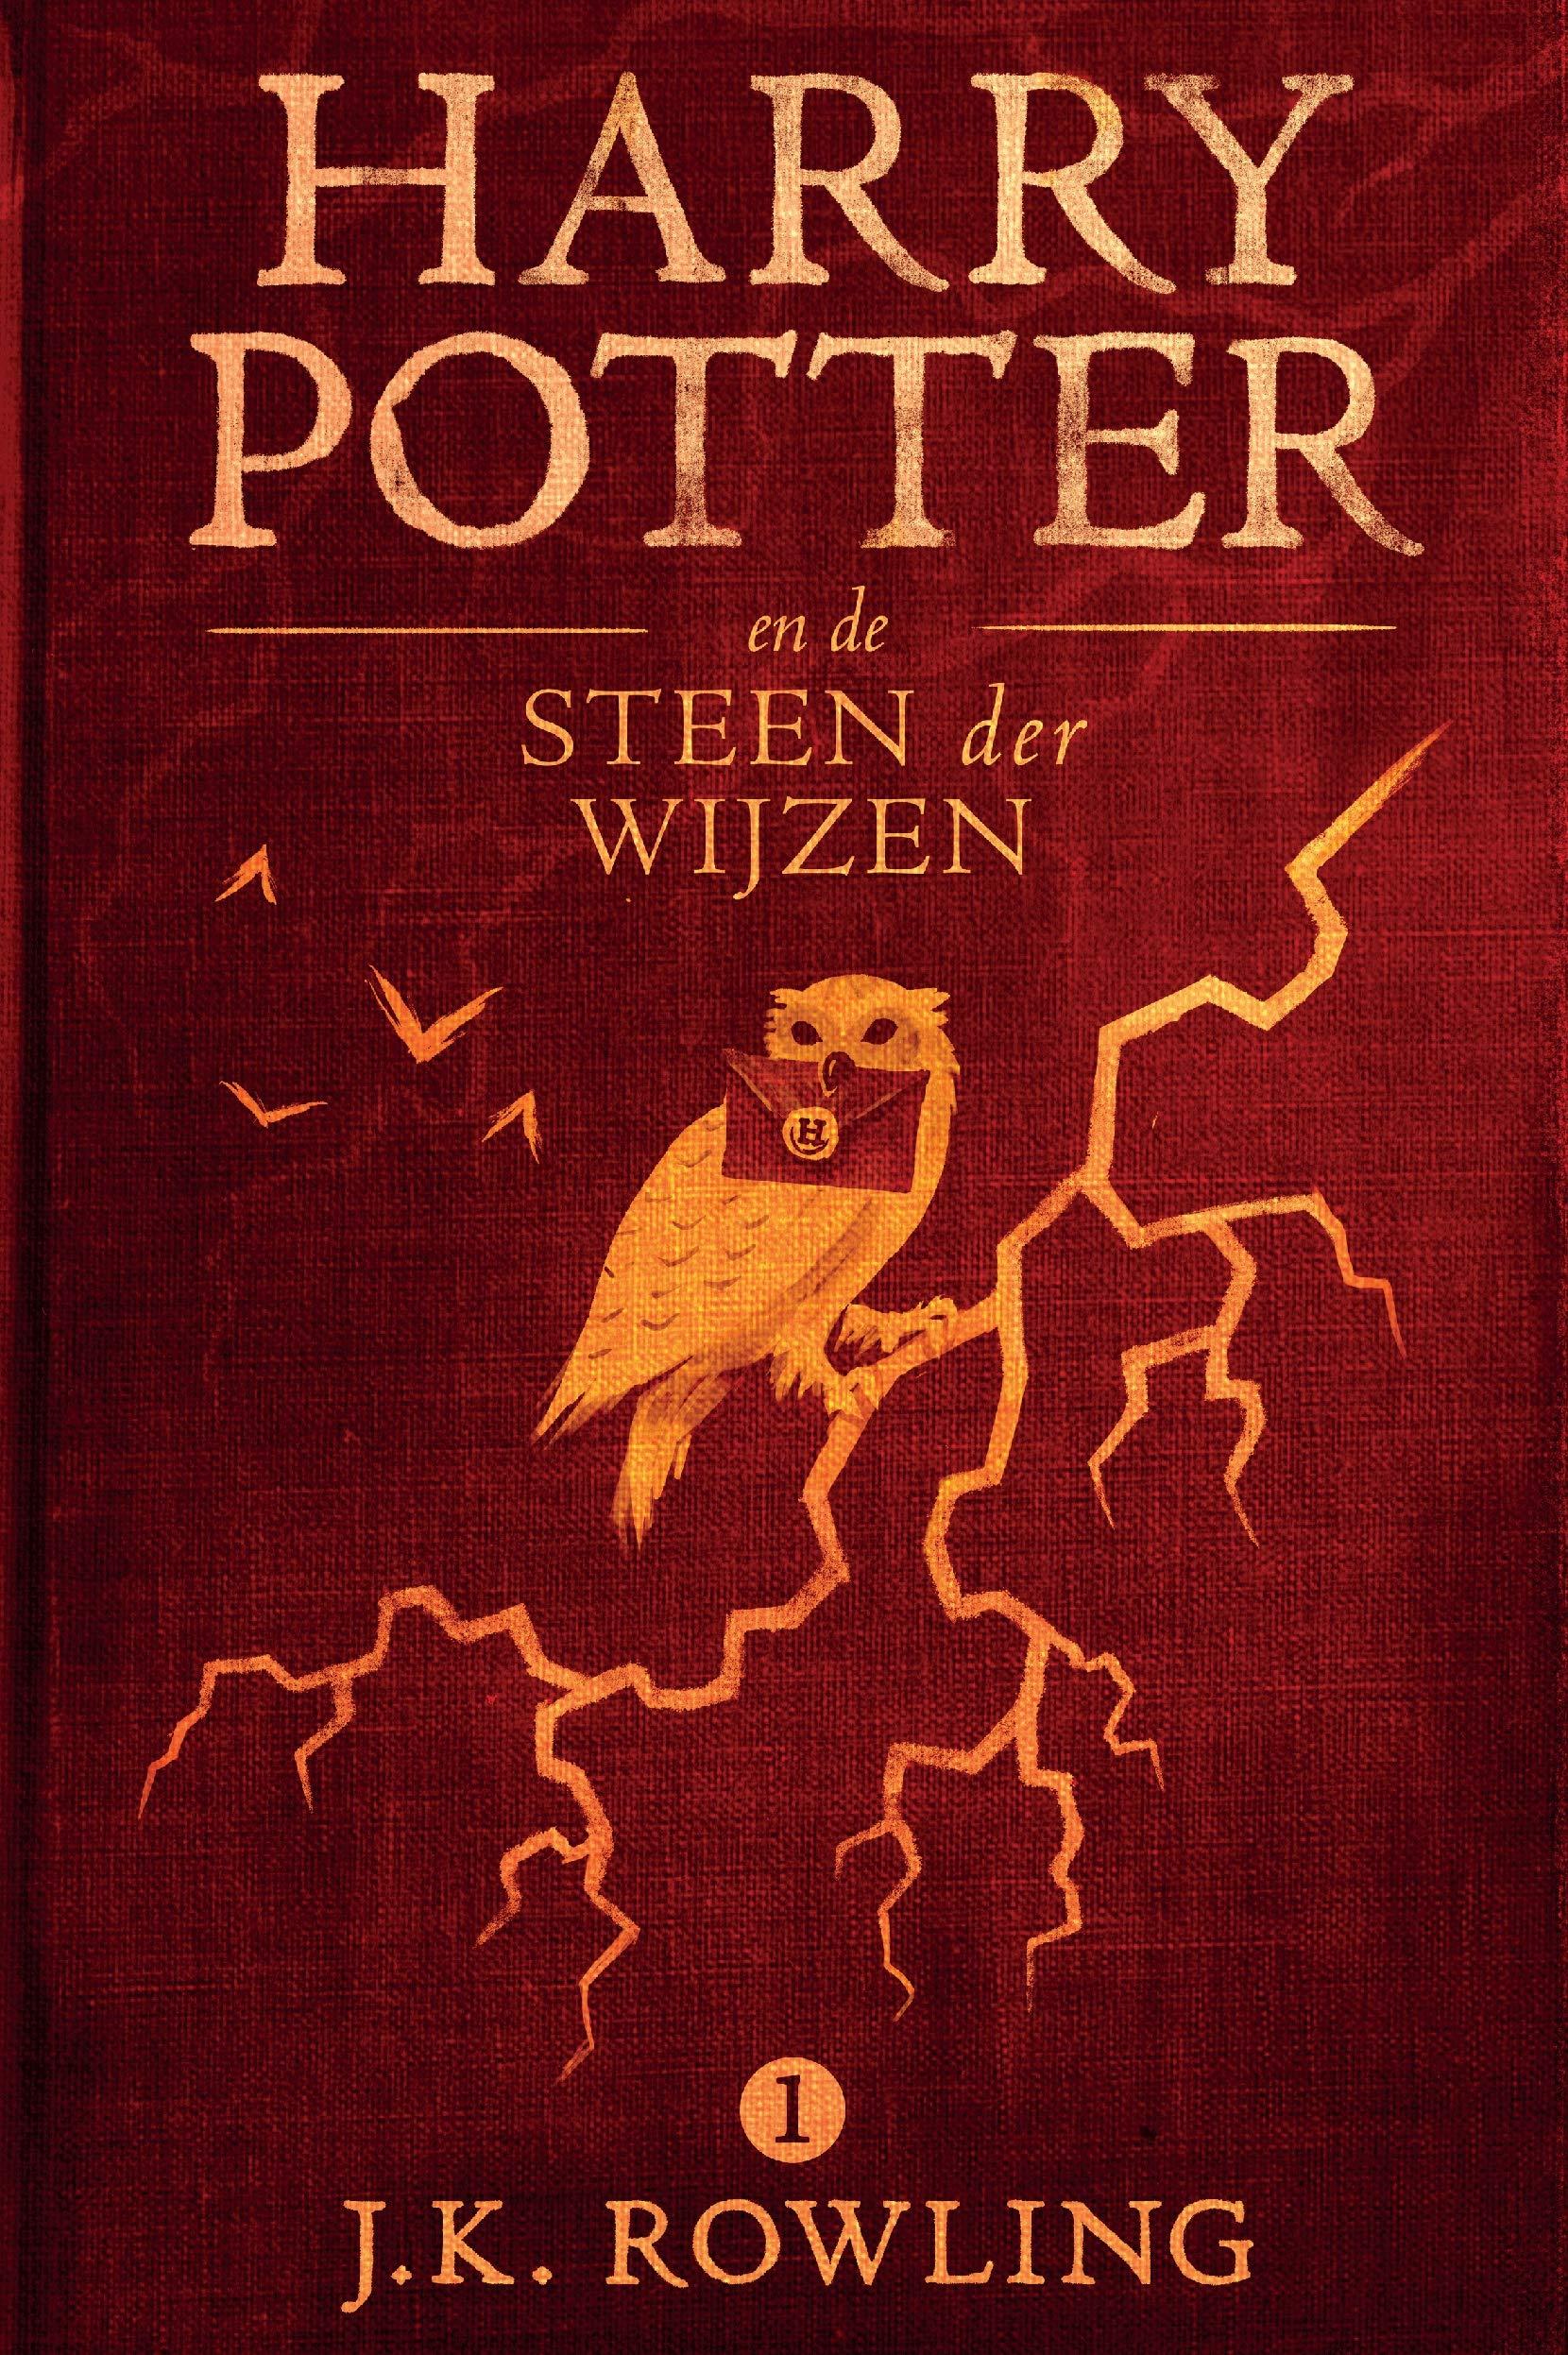 Amazon Com Harry Potter En De Steen Der Wijzen Dutch Edition Ebook Rowling J K Buddingh Wiebe Kindle Store